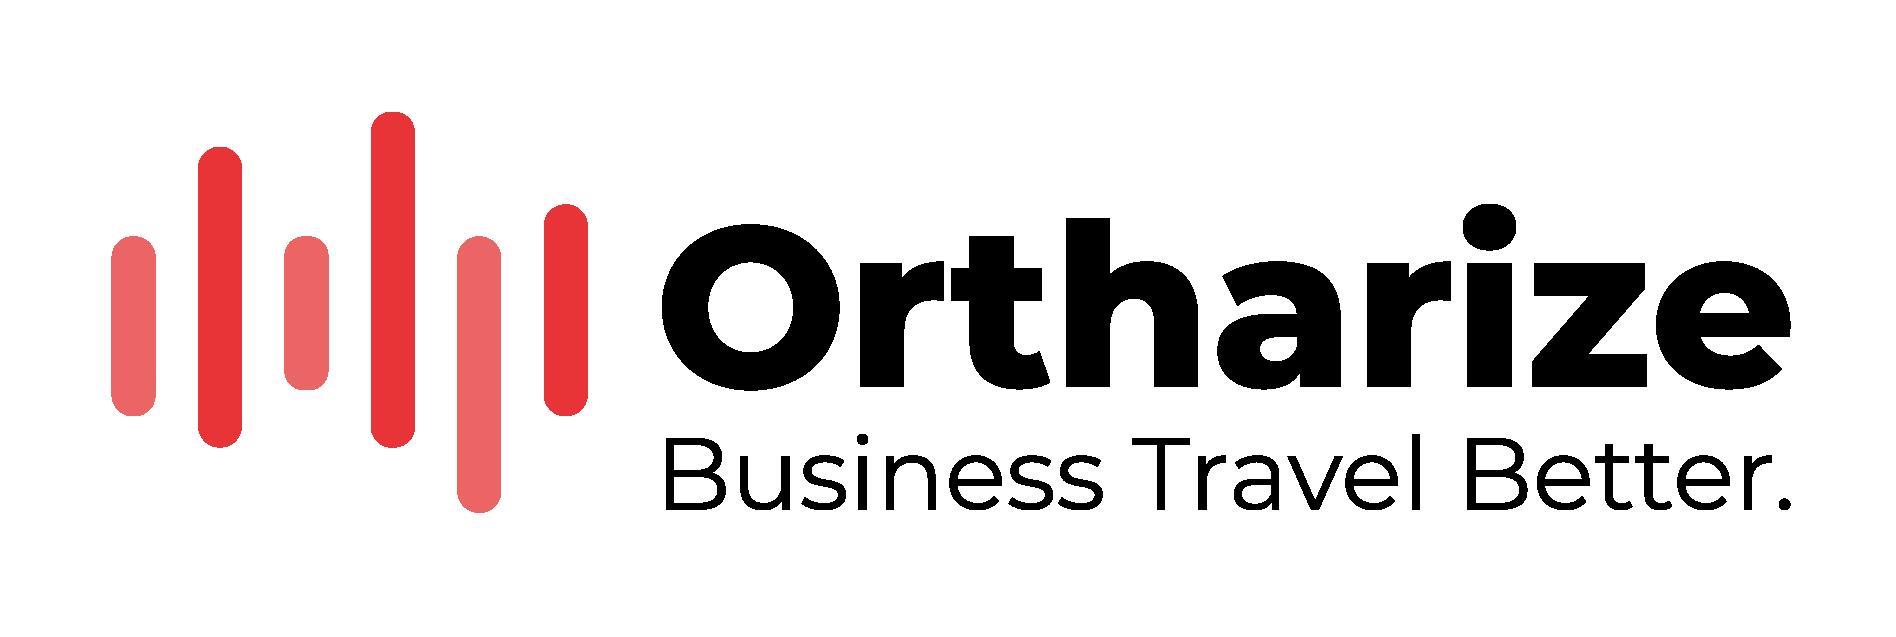 Ortharize